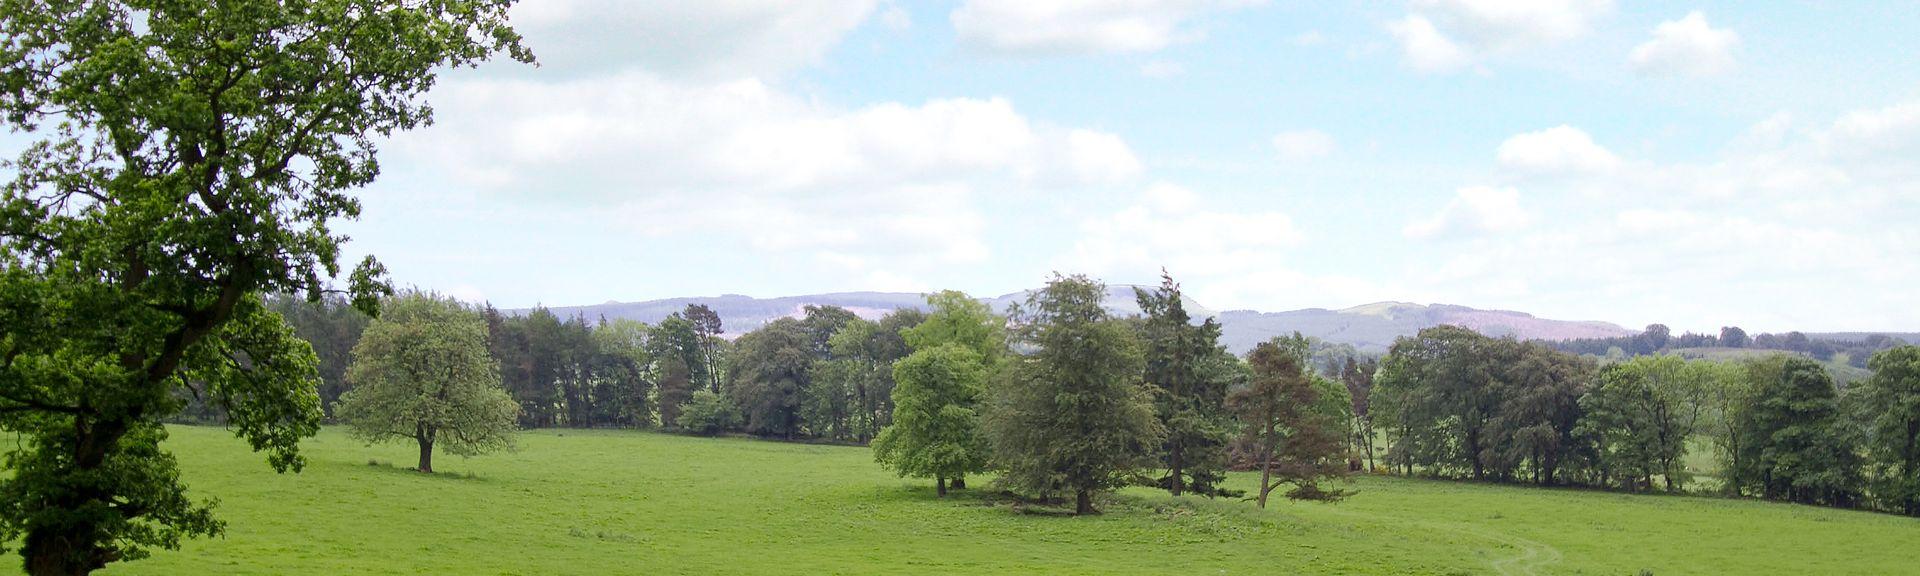 Aberdour Castle, Burntisland, Scotland, UK